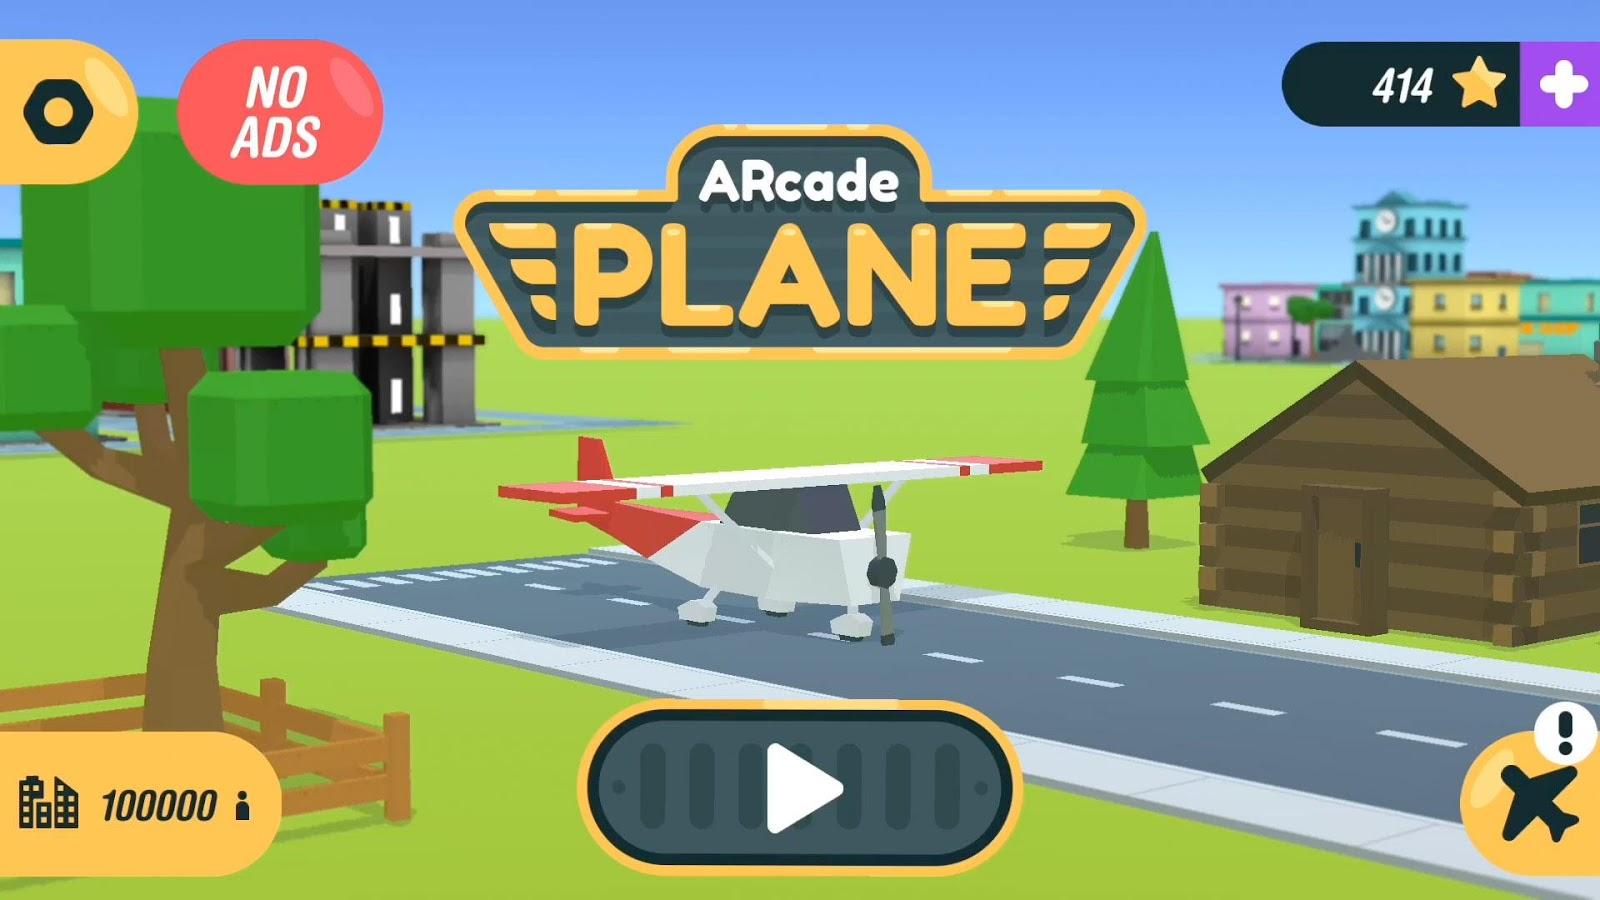 Bonus Round] SiNKR, Ayo: A Rain Tale, Arcade Plane 3D, GLOBE